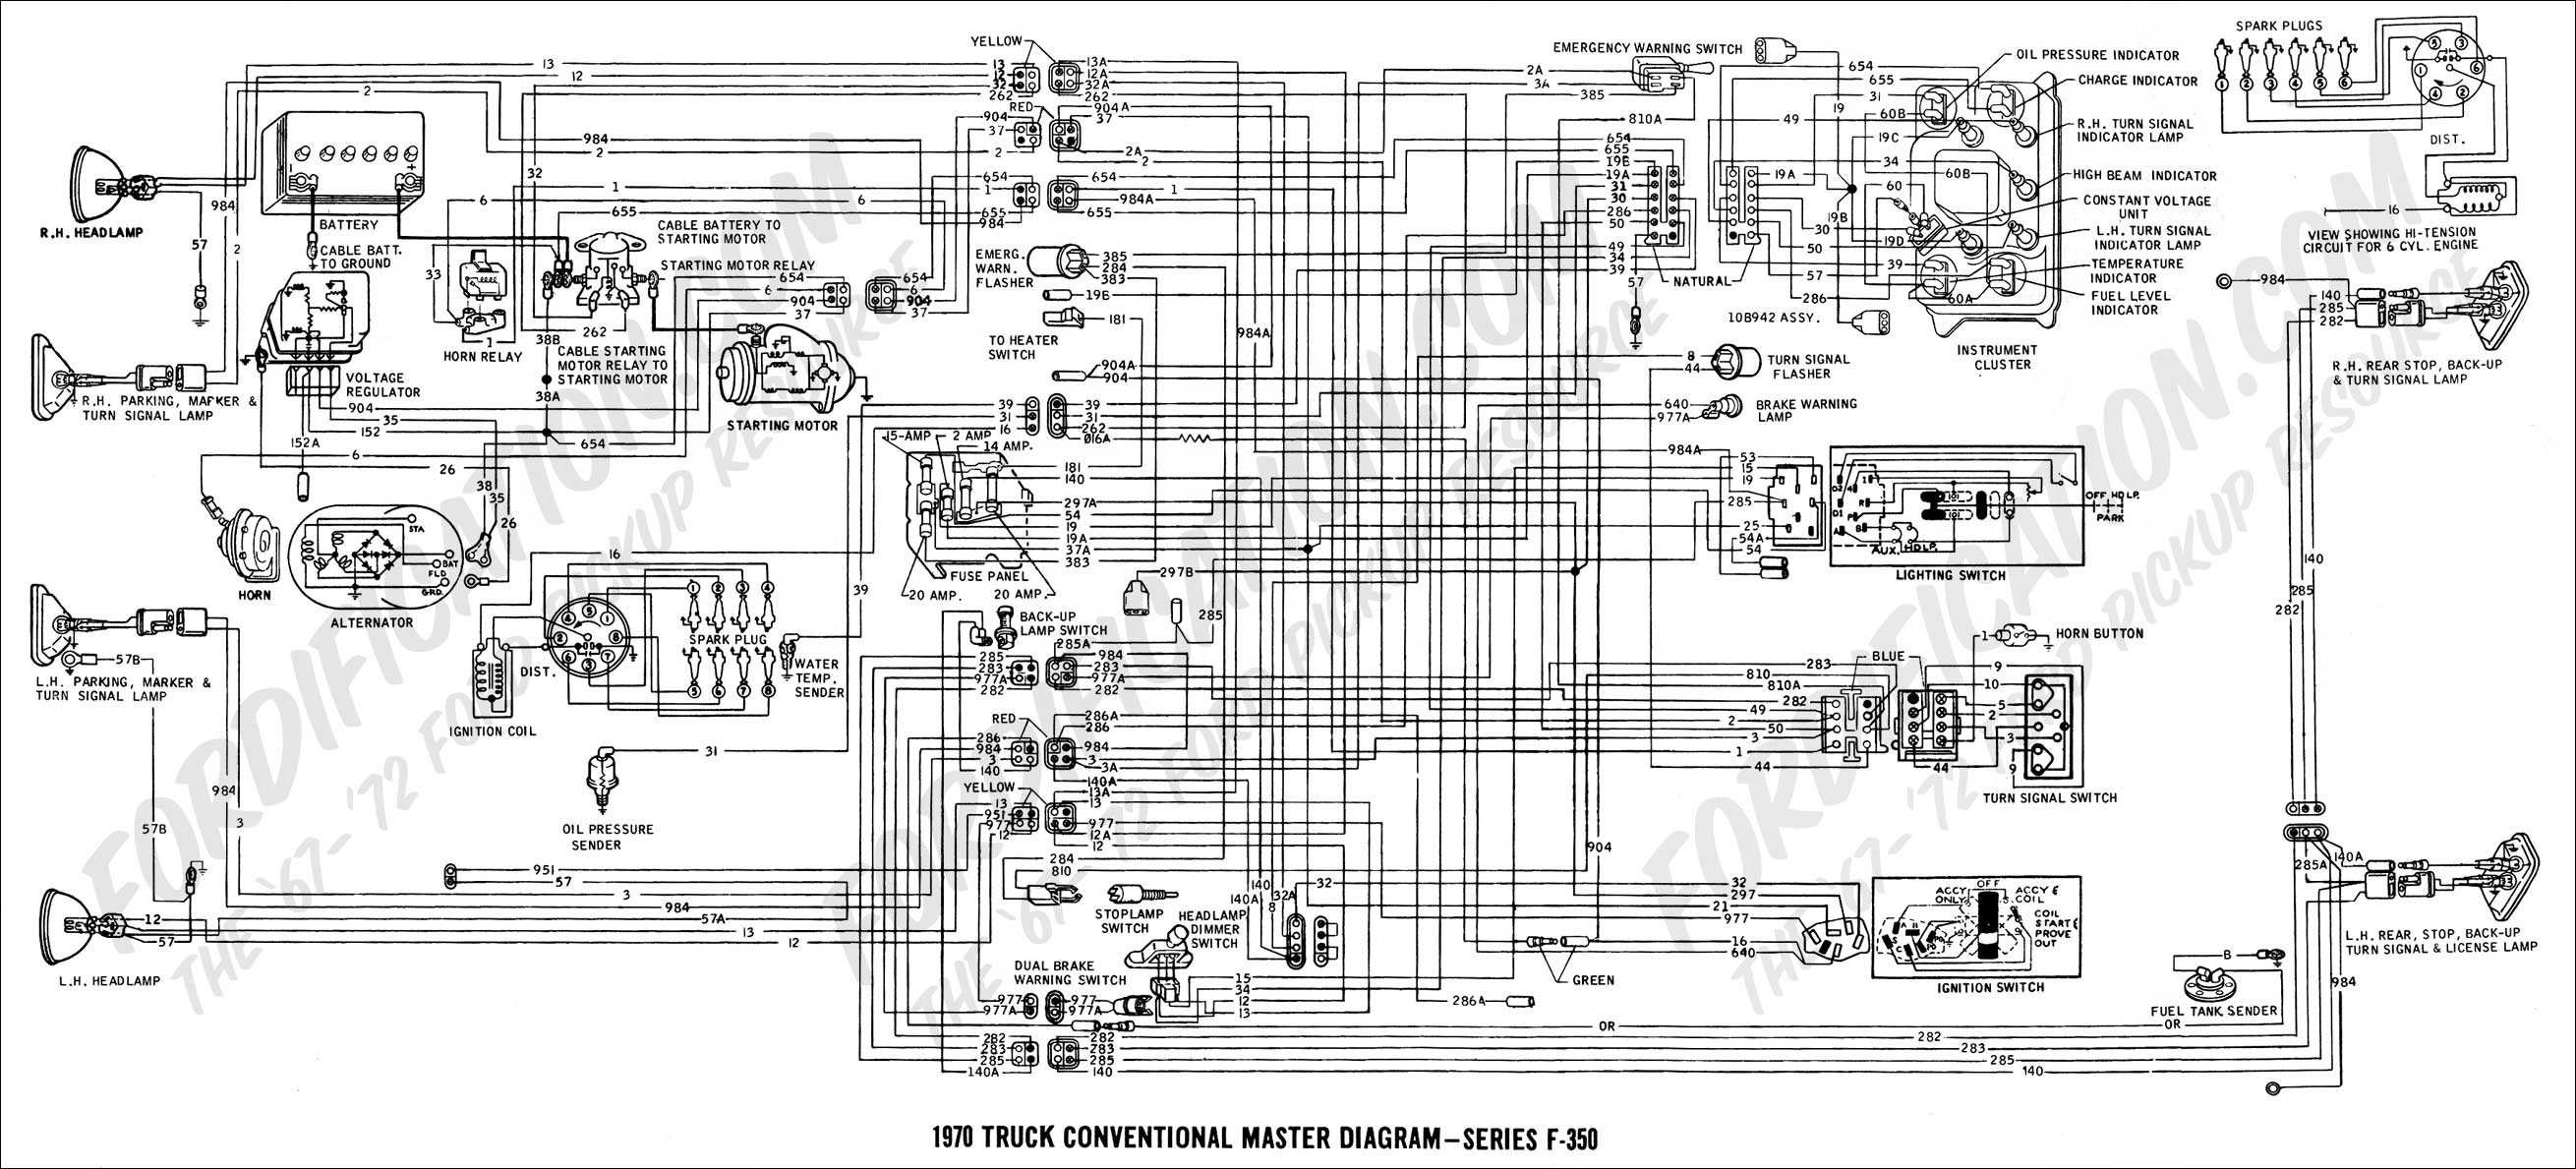 Truck Camper Wiring Diagram Unique | Wiring Diagram Image